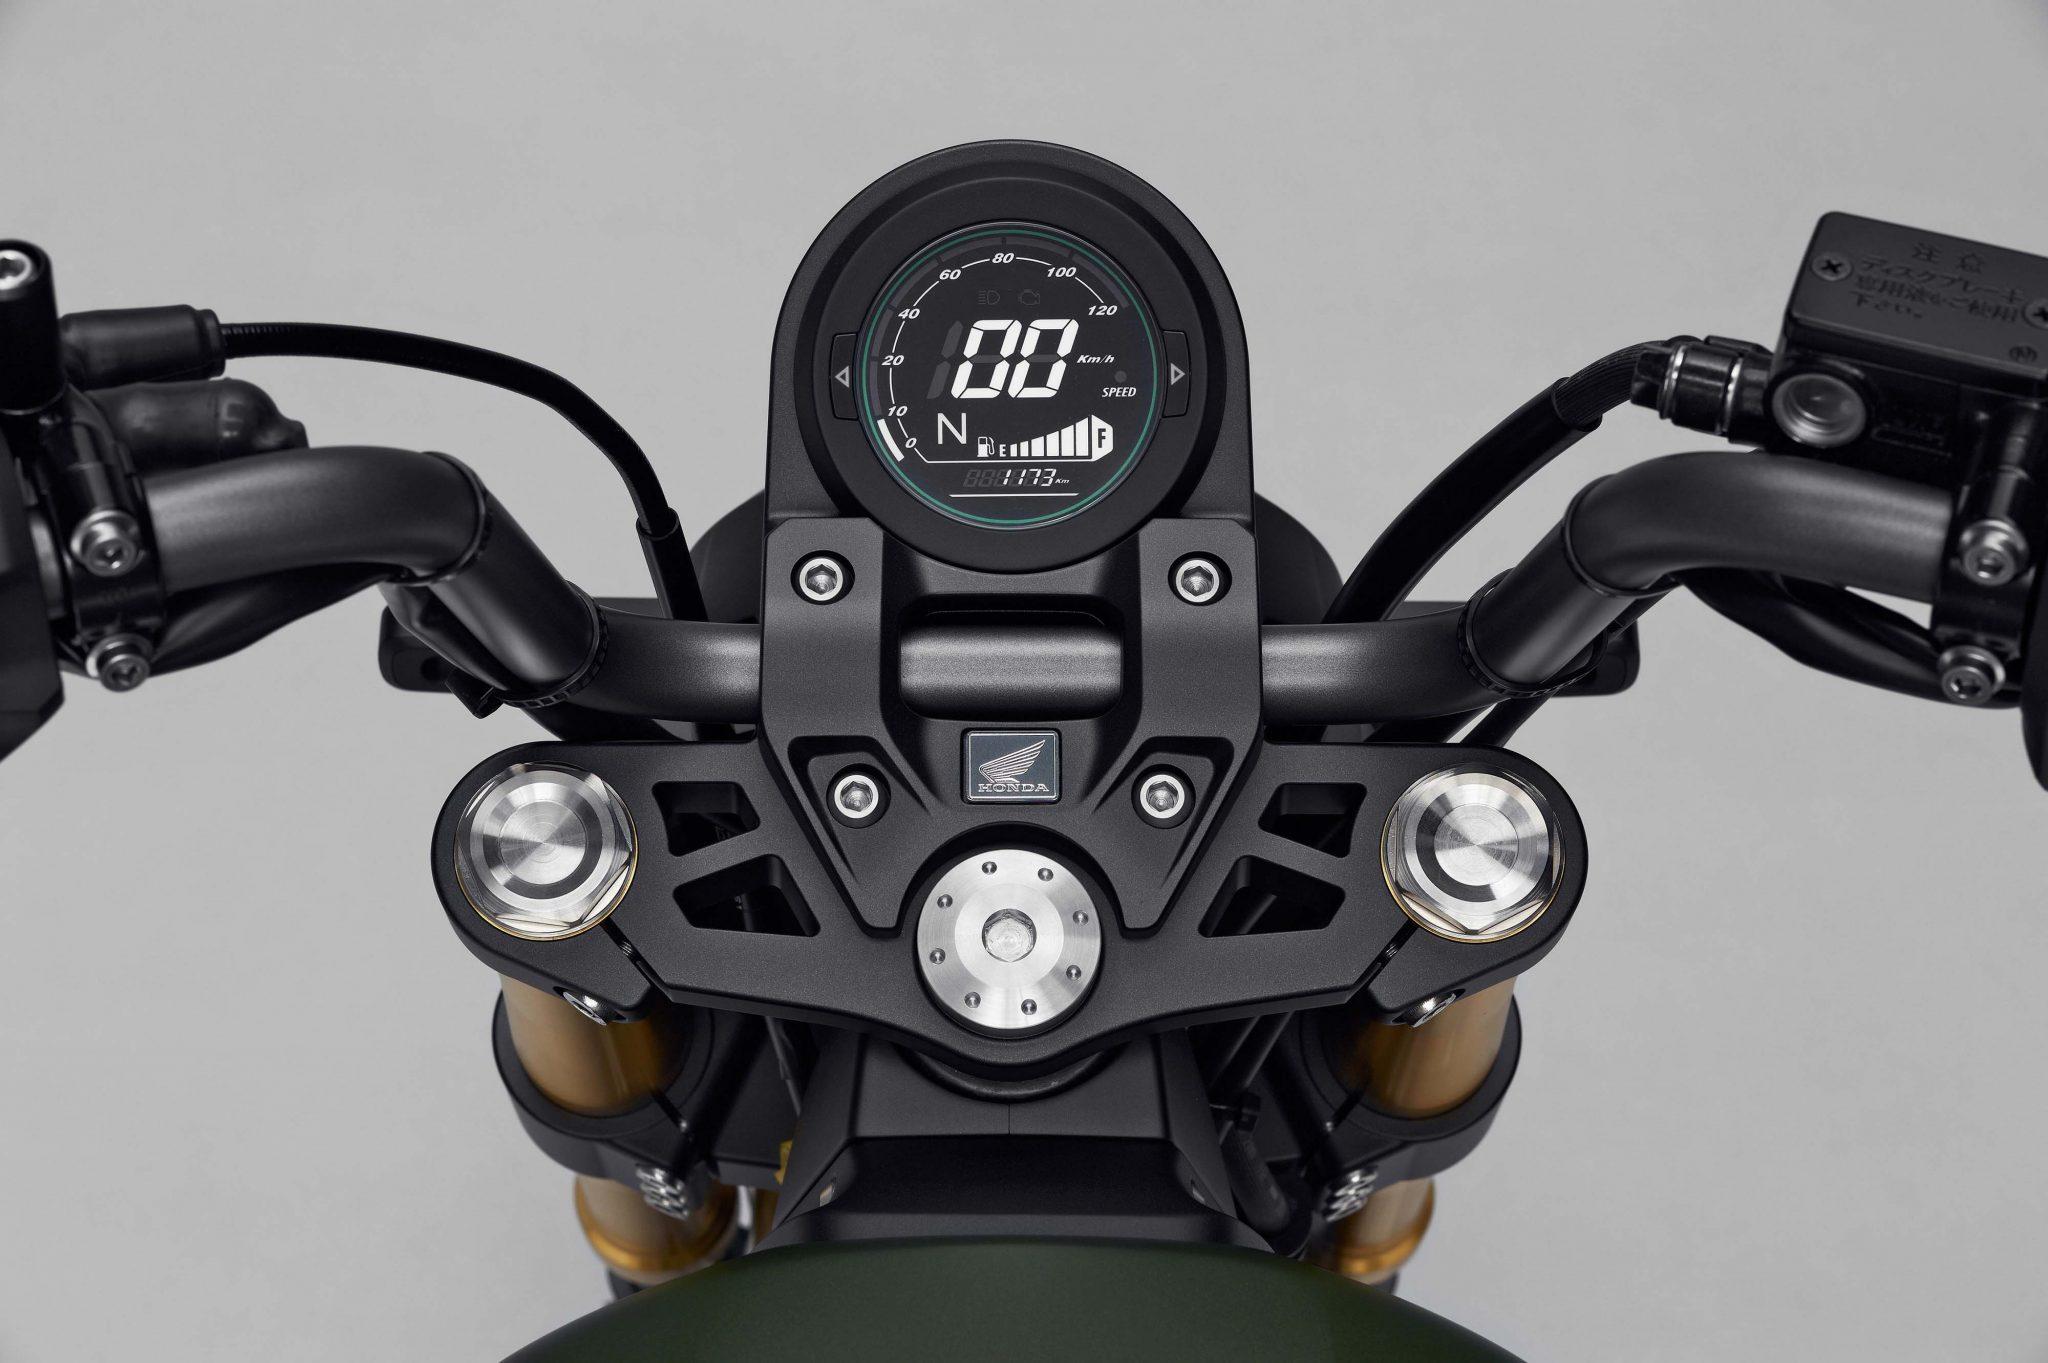 GROM50 Scrambler Concept-Two